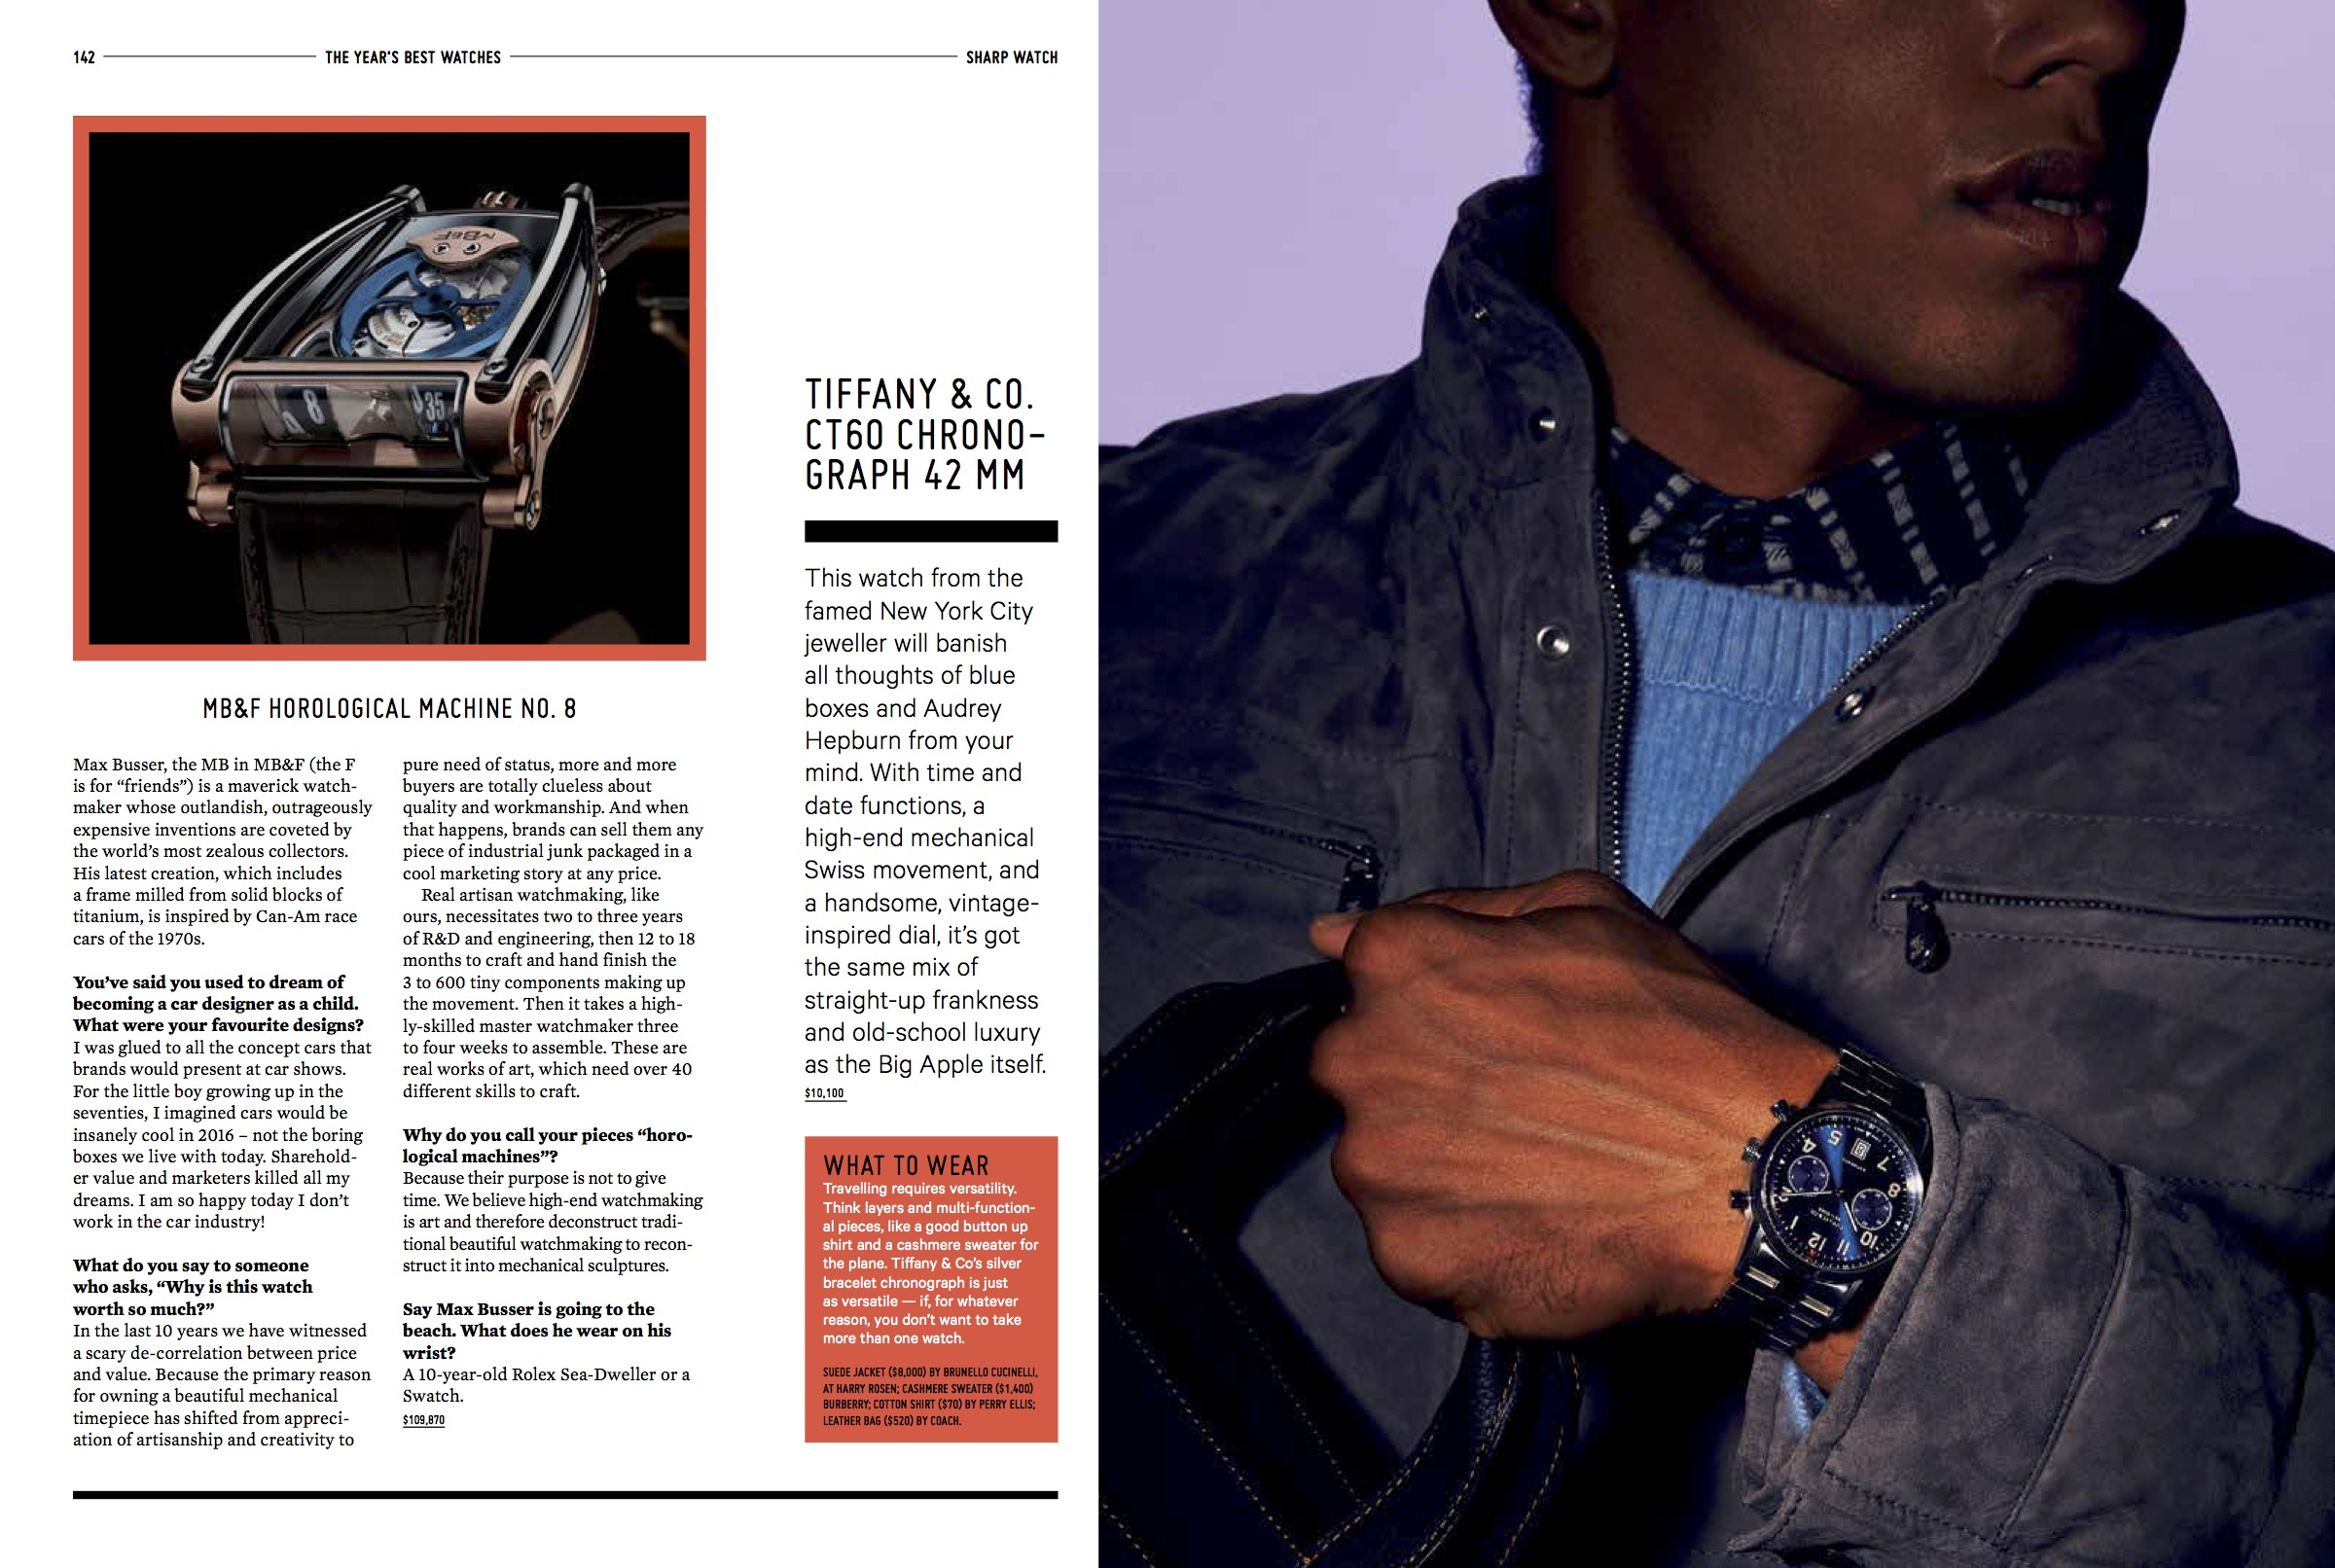 Sharp Watch 5.jpg